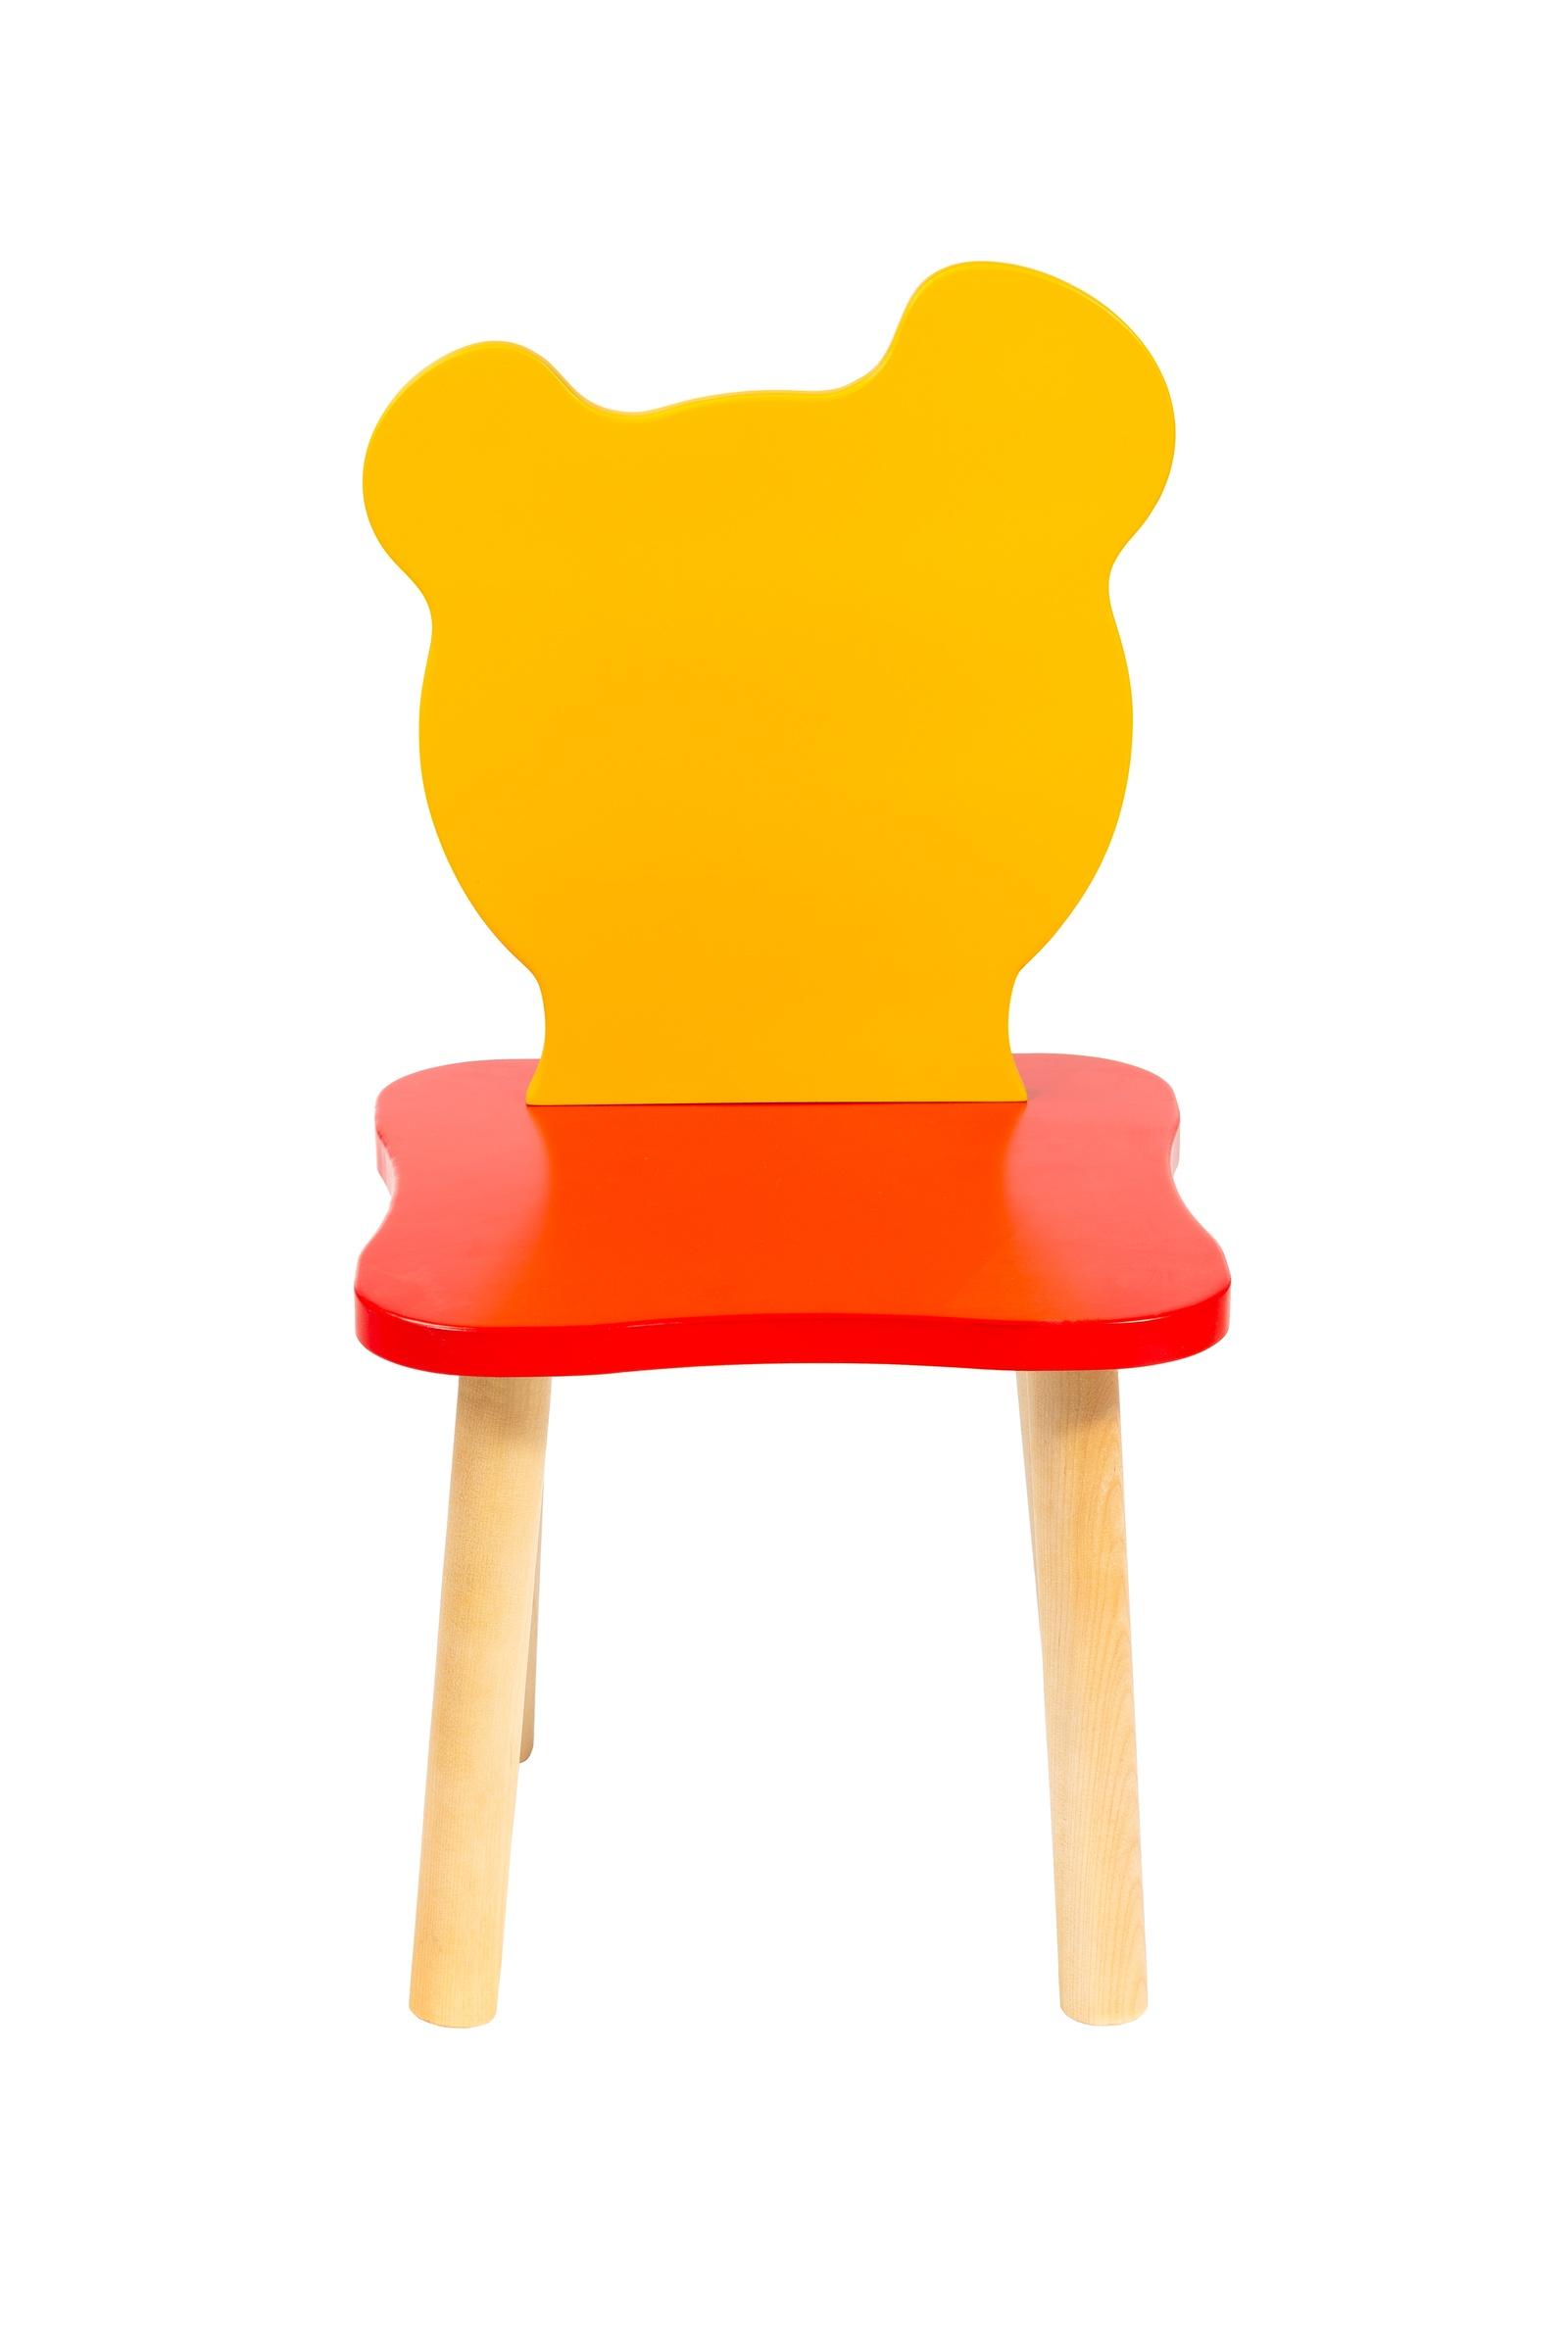 Детский стул Polli Tolli Джери,25867, 25867 amf стул amf луиза н 36 красный 864bj8w